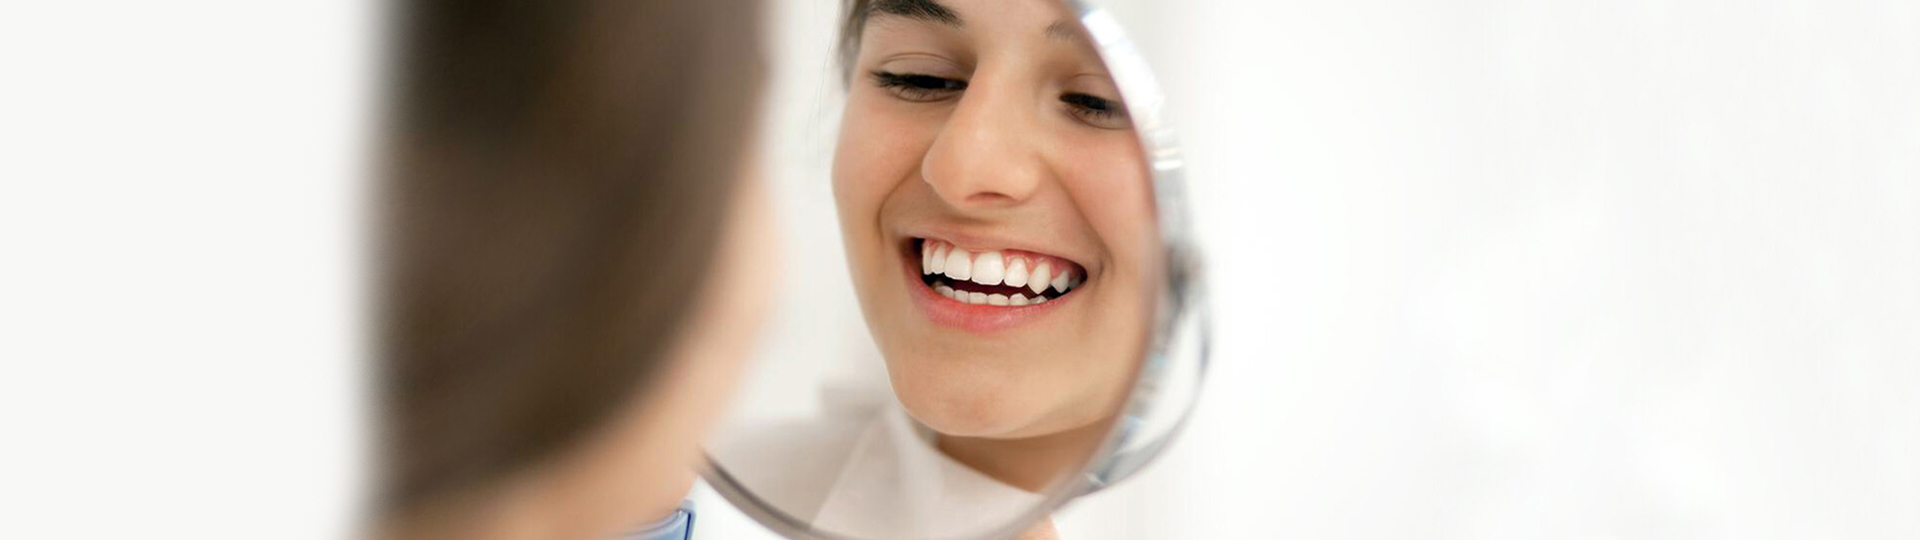 Gum Disease: Symptoms and Treatment